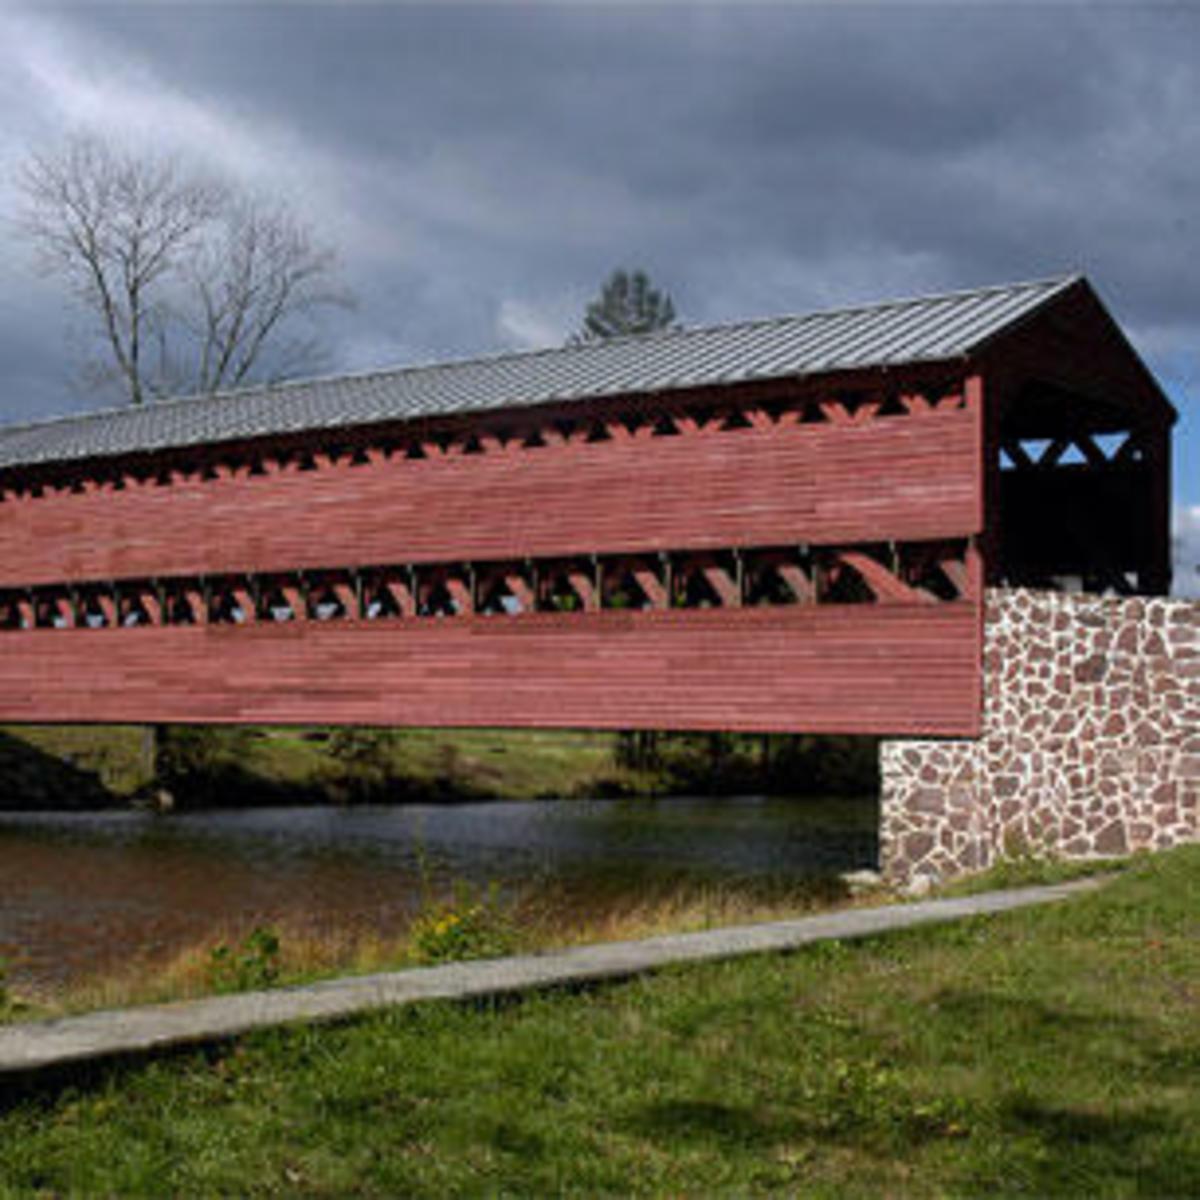 Sachs Covered Bridge in Gettysburg, PA